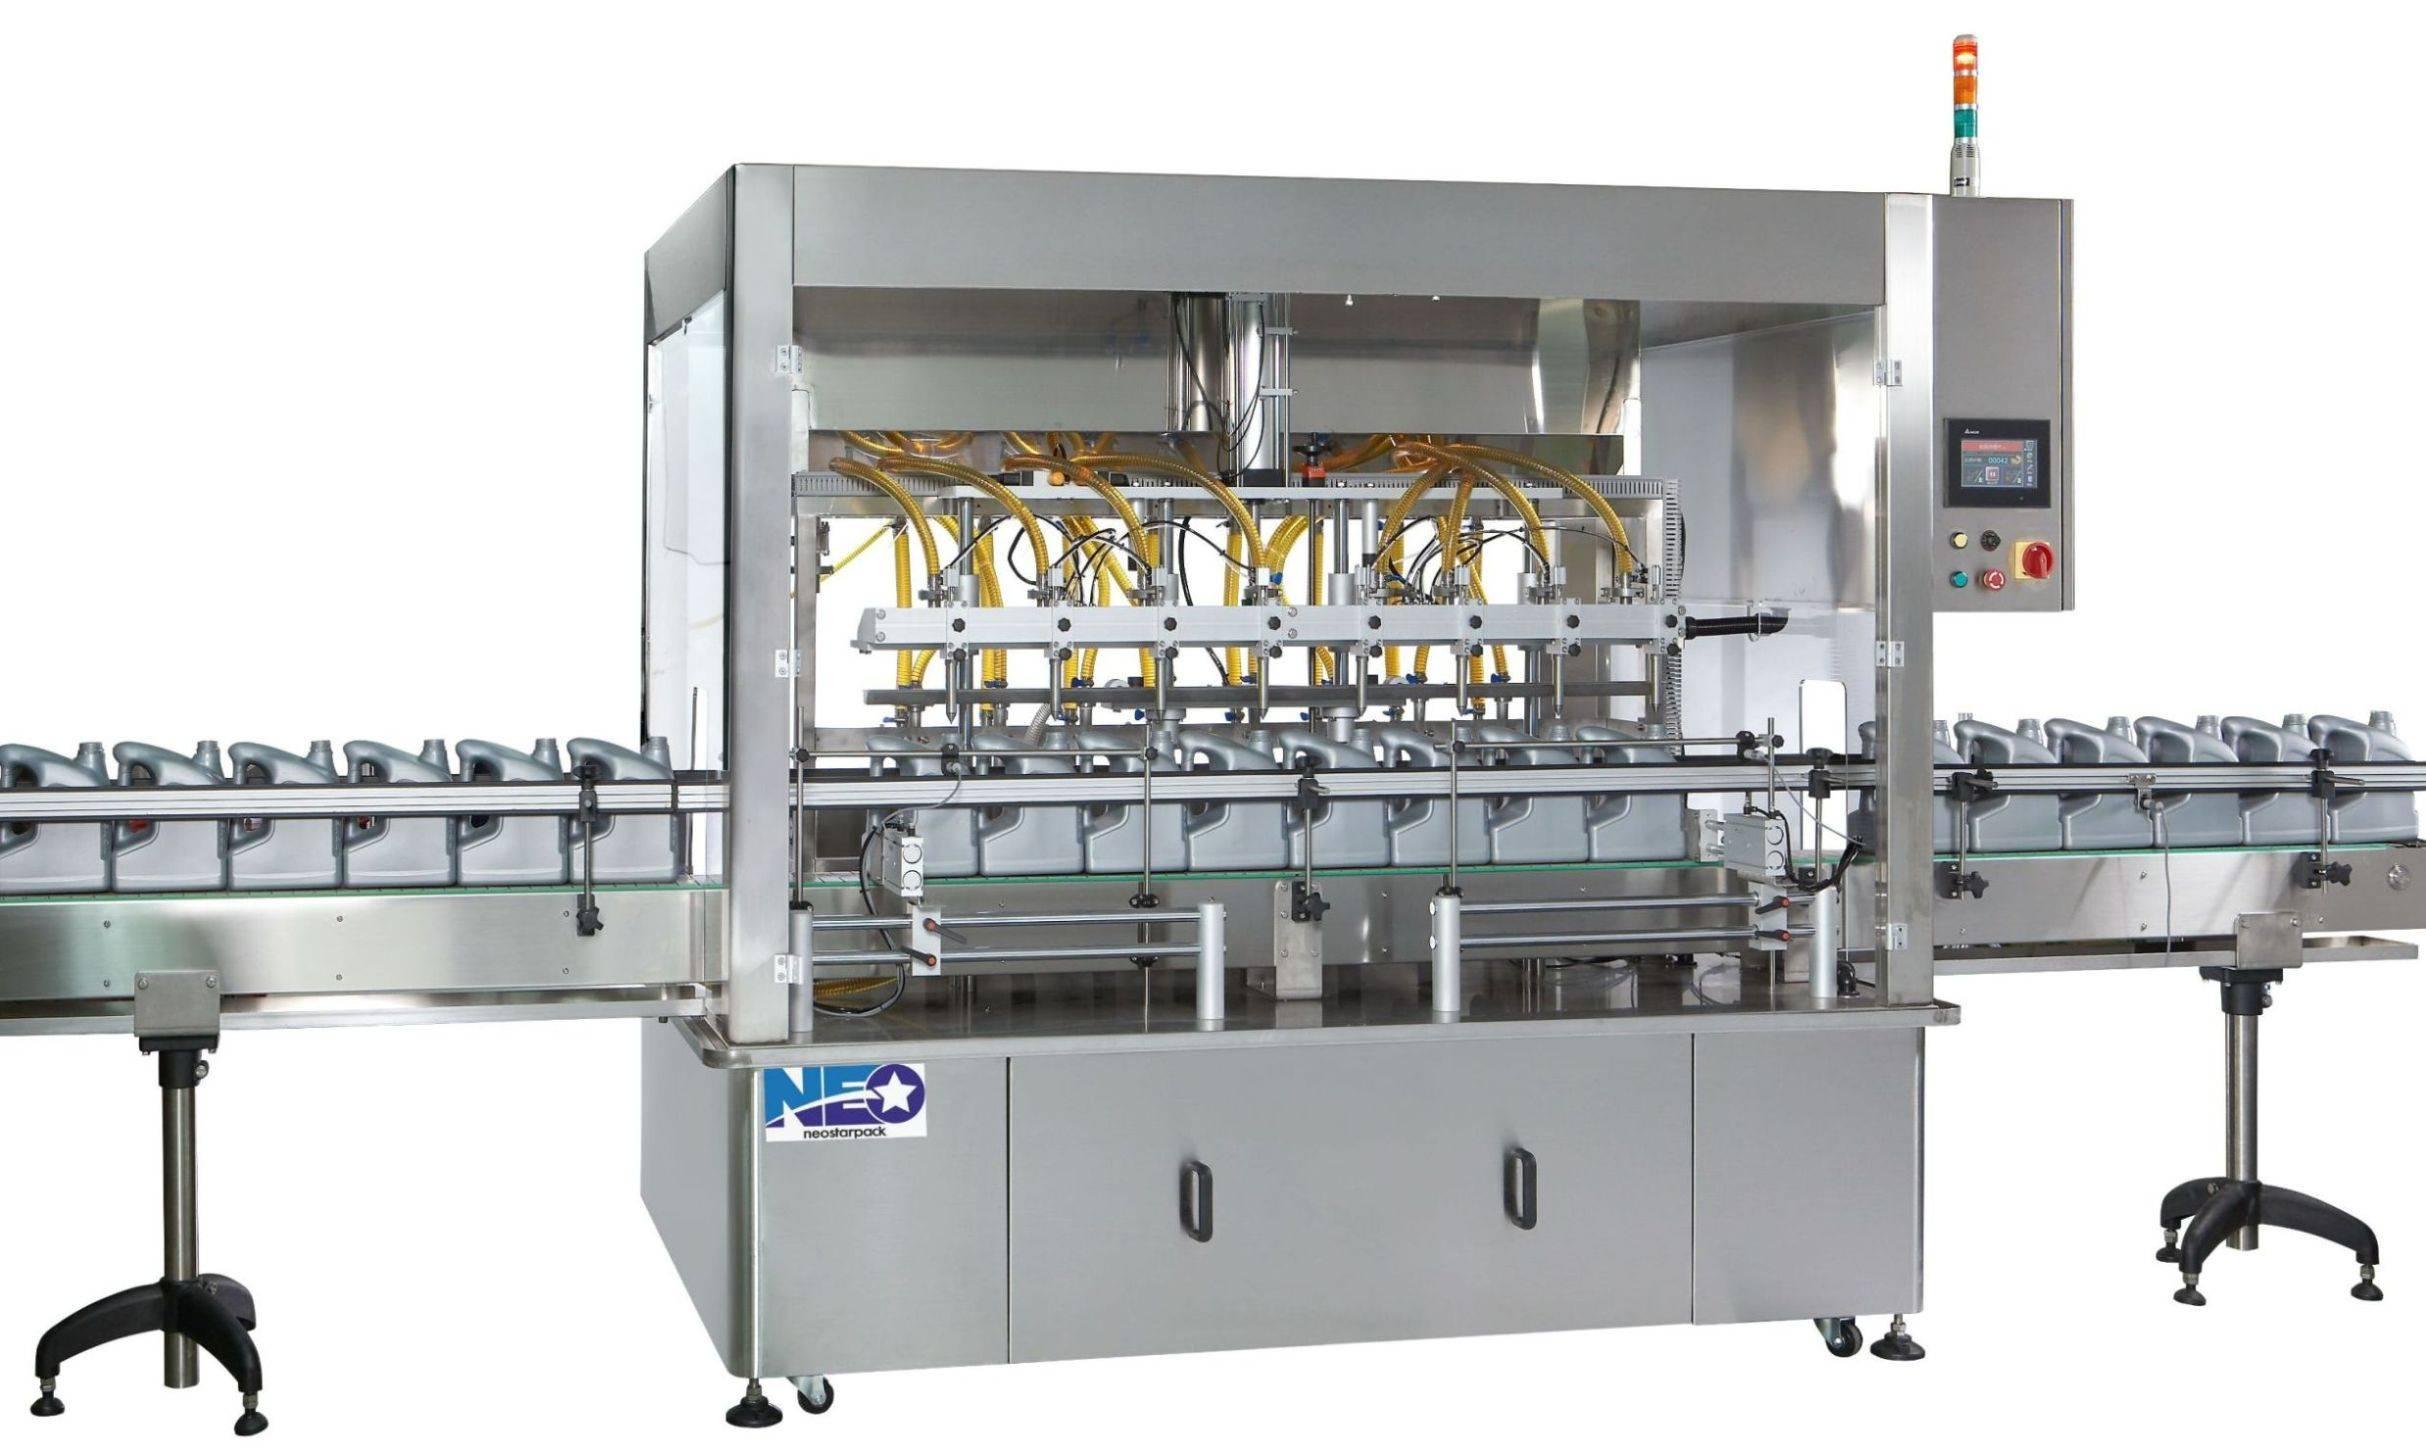 Automatic Liquid Filler FG-585S